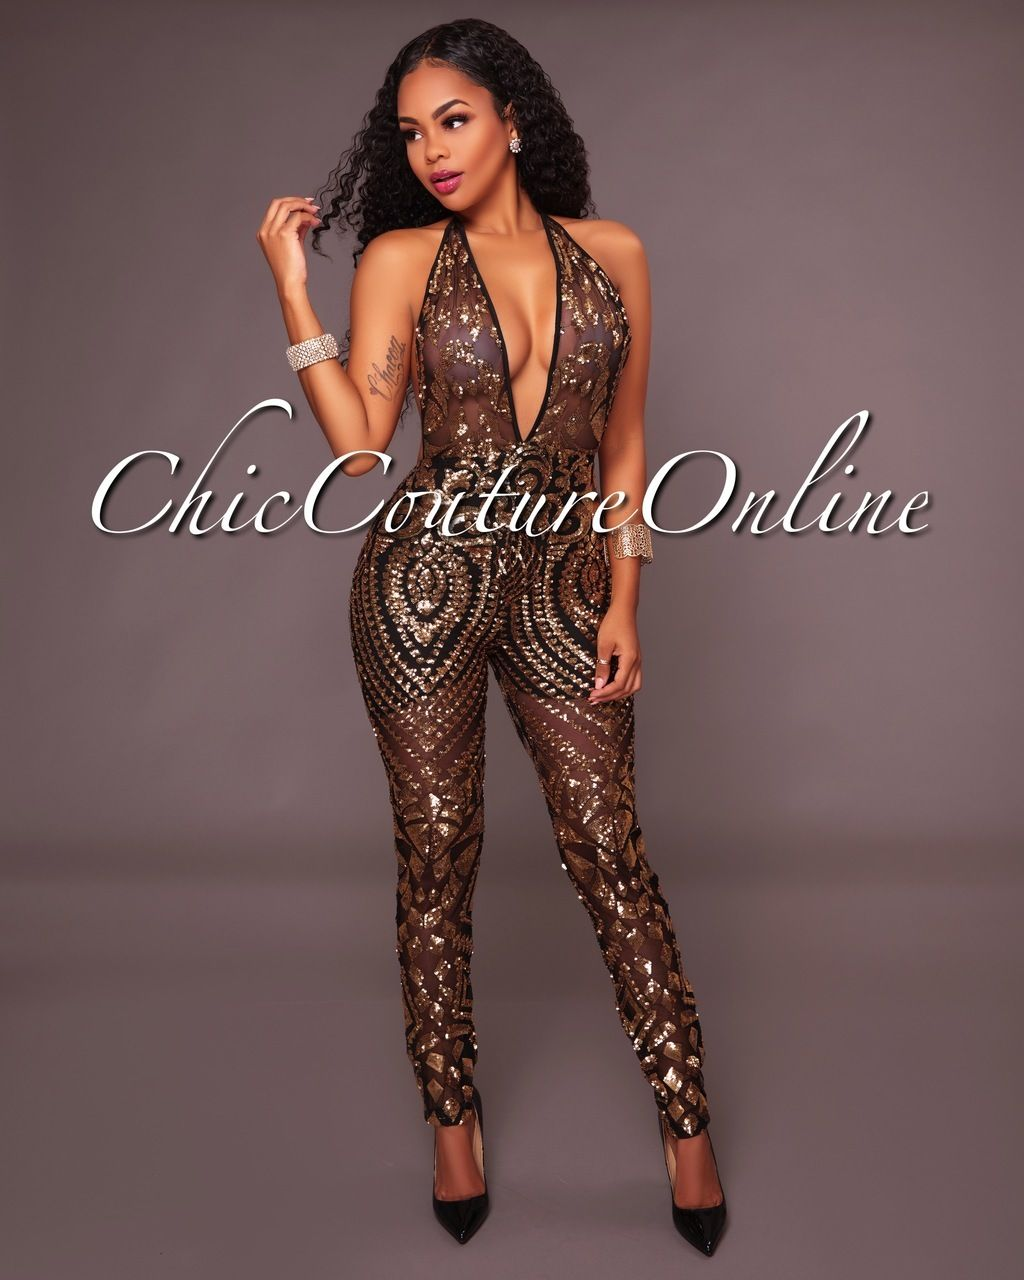 2cb4b188436 Chic Couture Online - Annalise Black Gold Sequin Deep V Jumpsuit